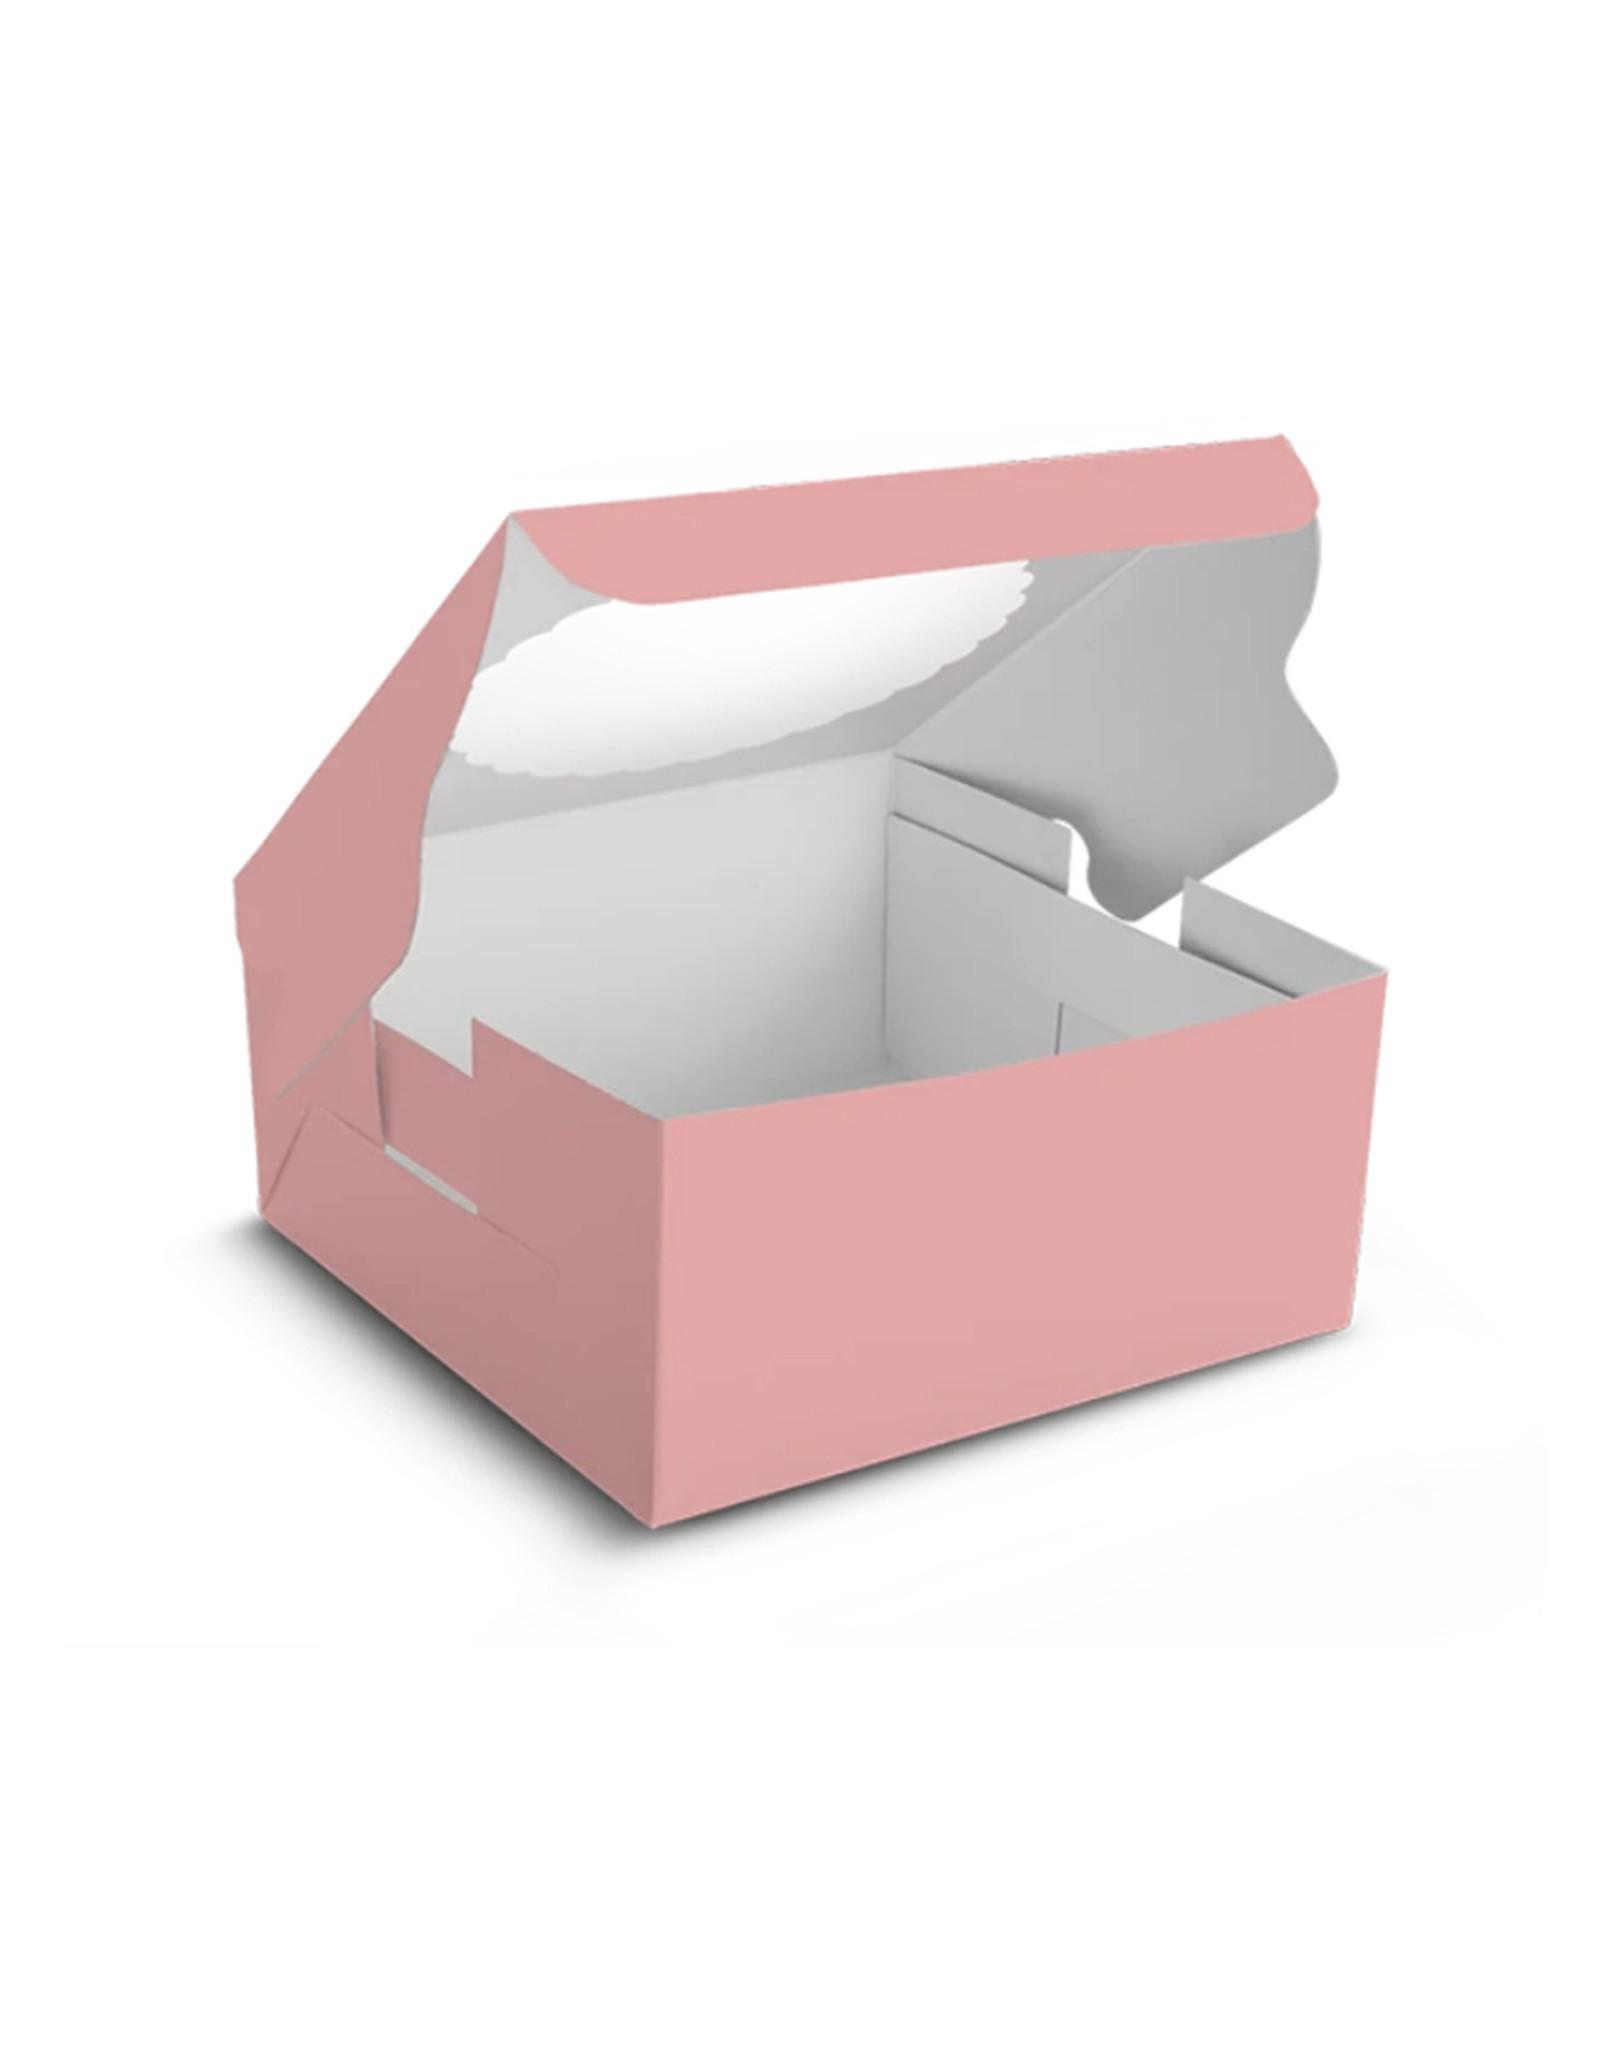 Pink window cake box - 203 x 203 x 127 mm (per 10 pieces)